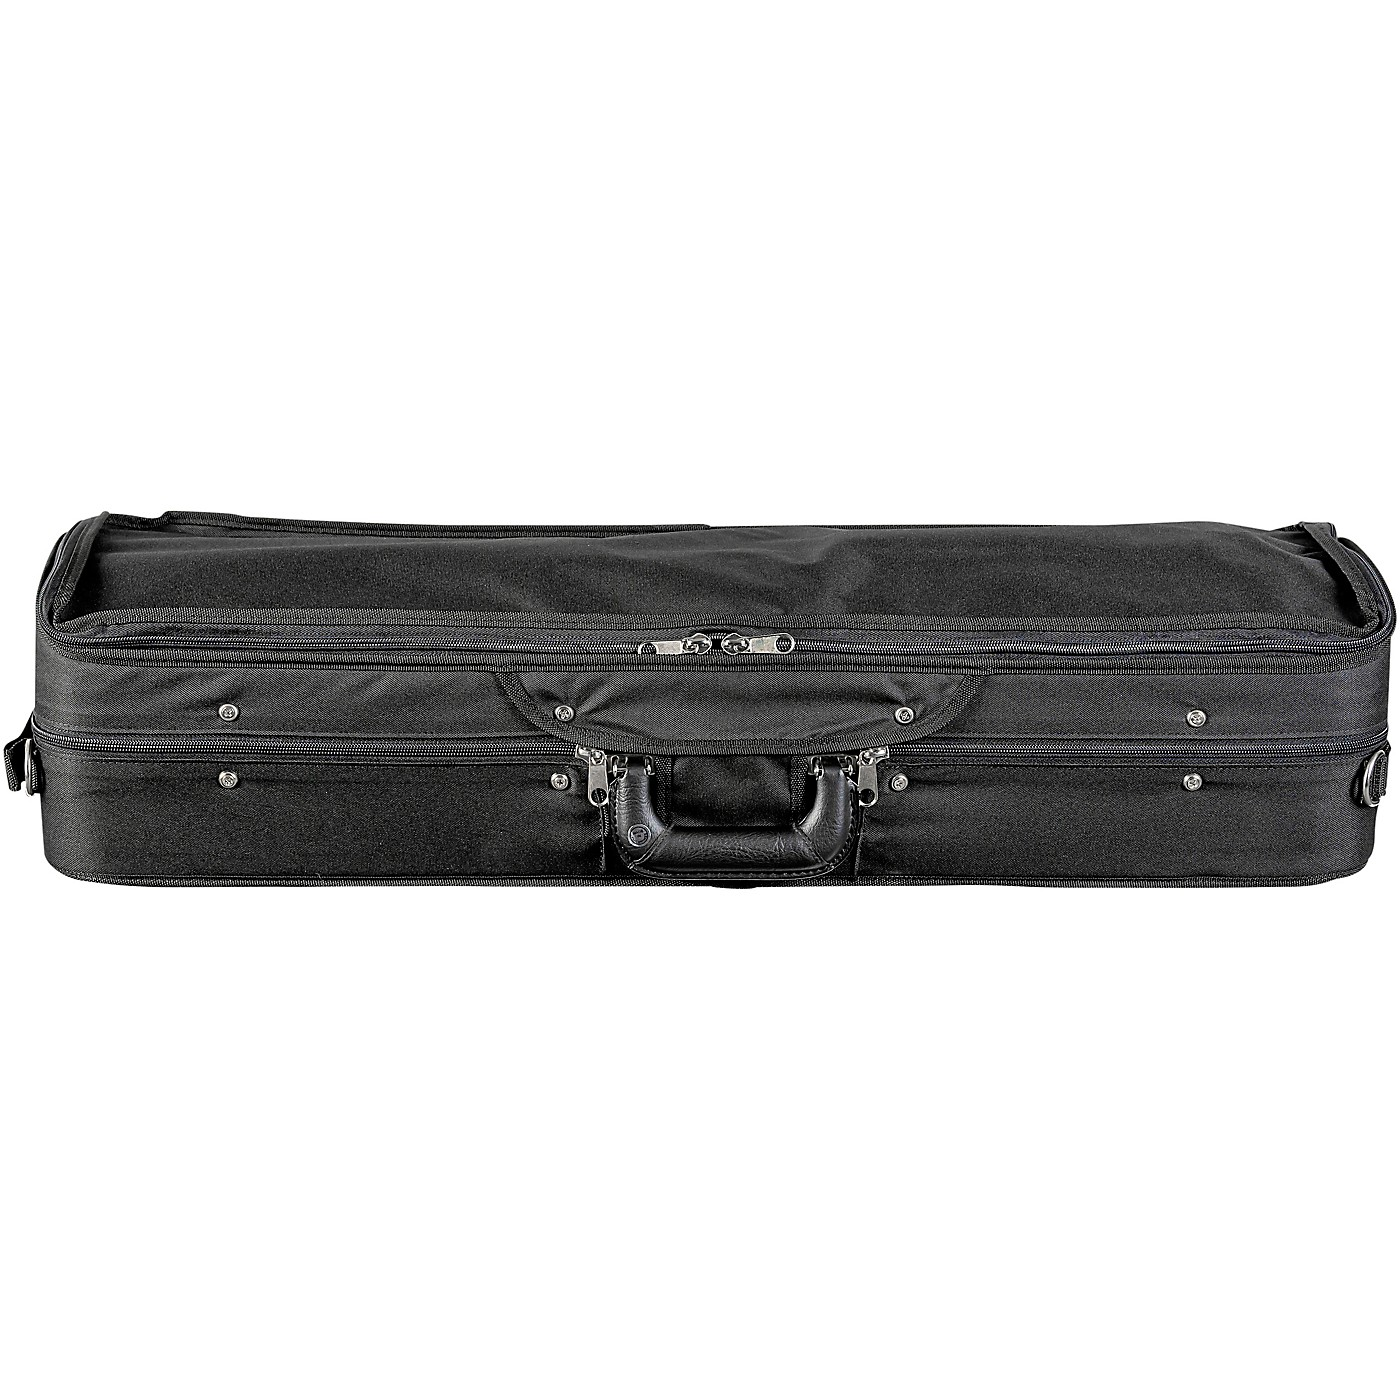 Bobelock Featherlite Oblong Suspension Violin Case, Velvet Interior thumbnail